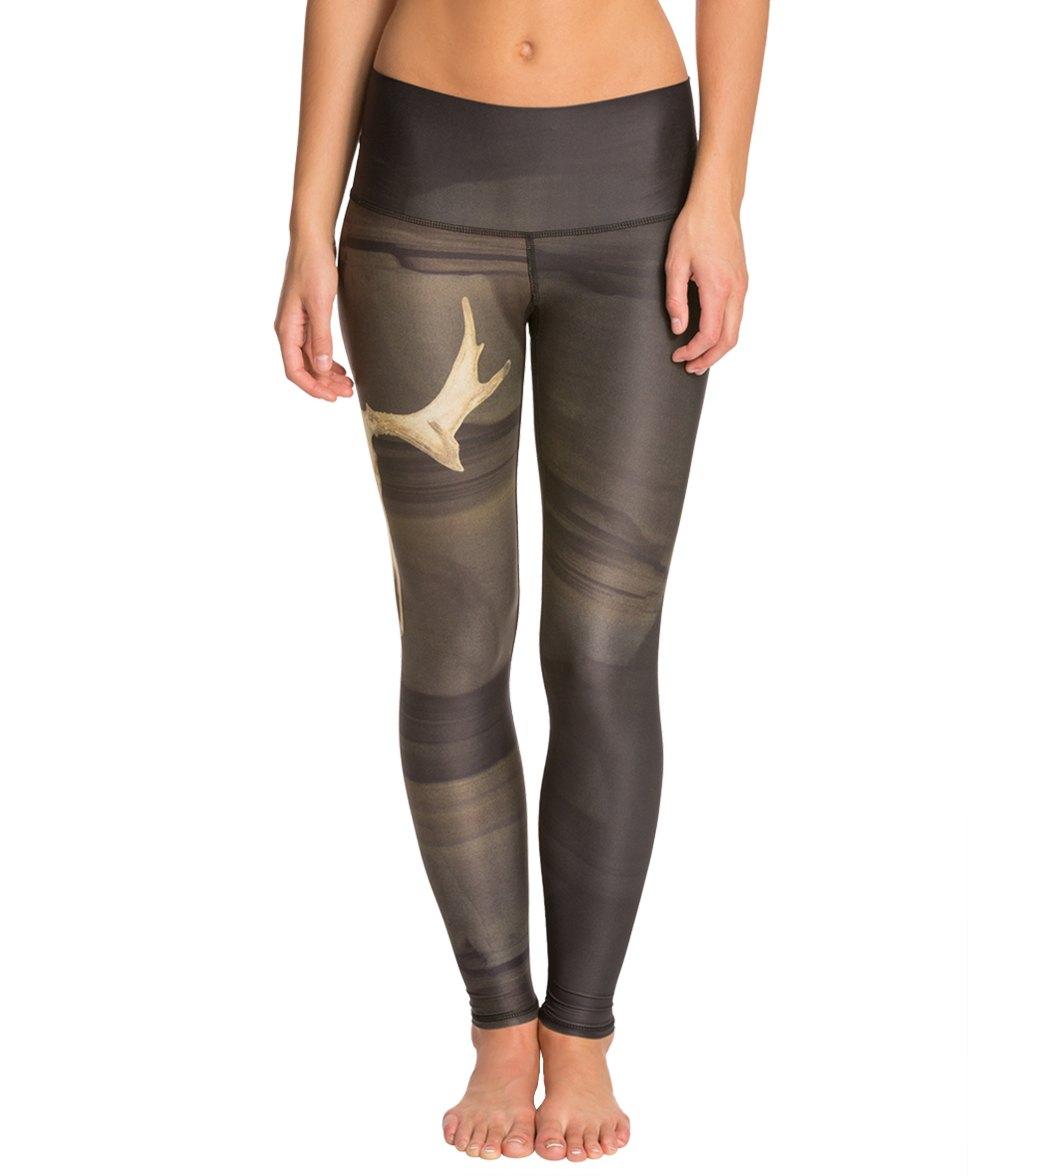 93483774ff Teeki Deer Medicine Hot Yoga Leggings at YogaOutlet.com - Free Shipping